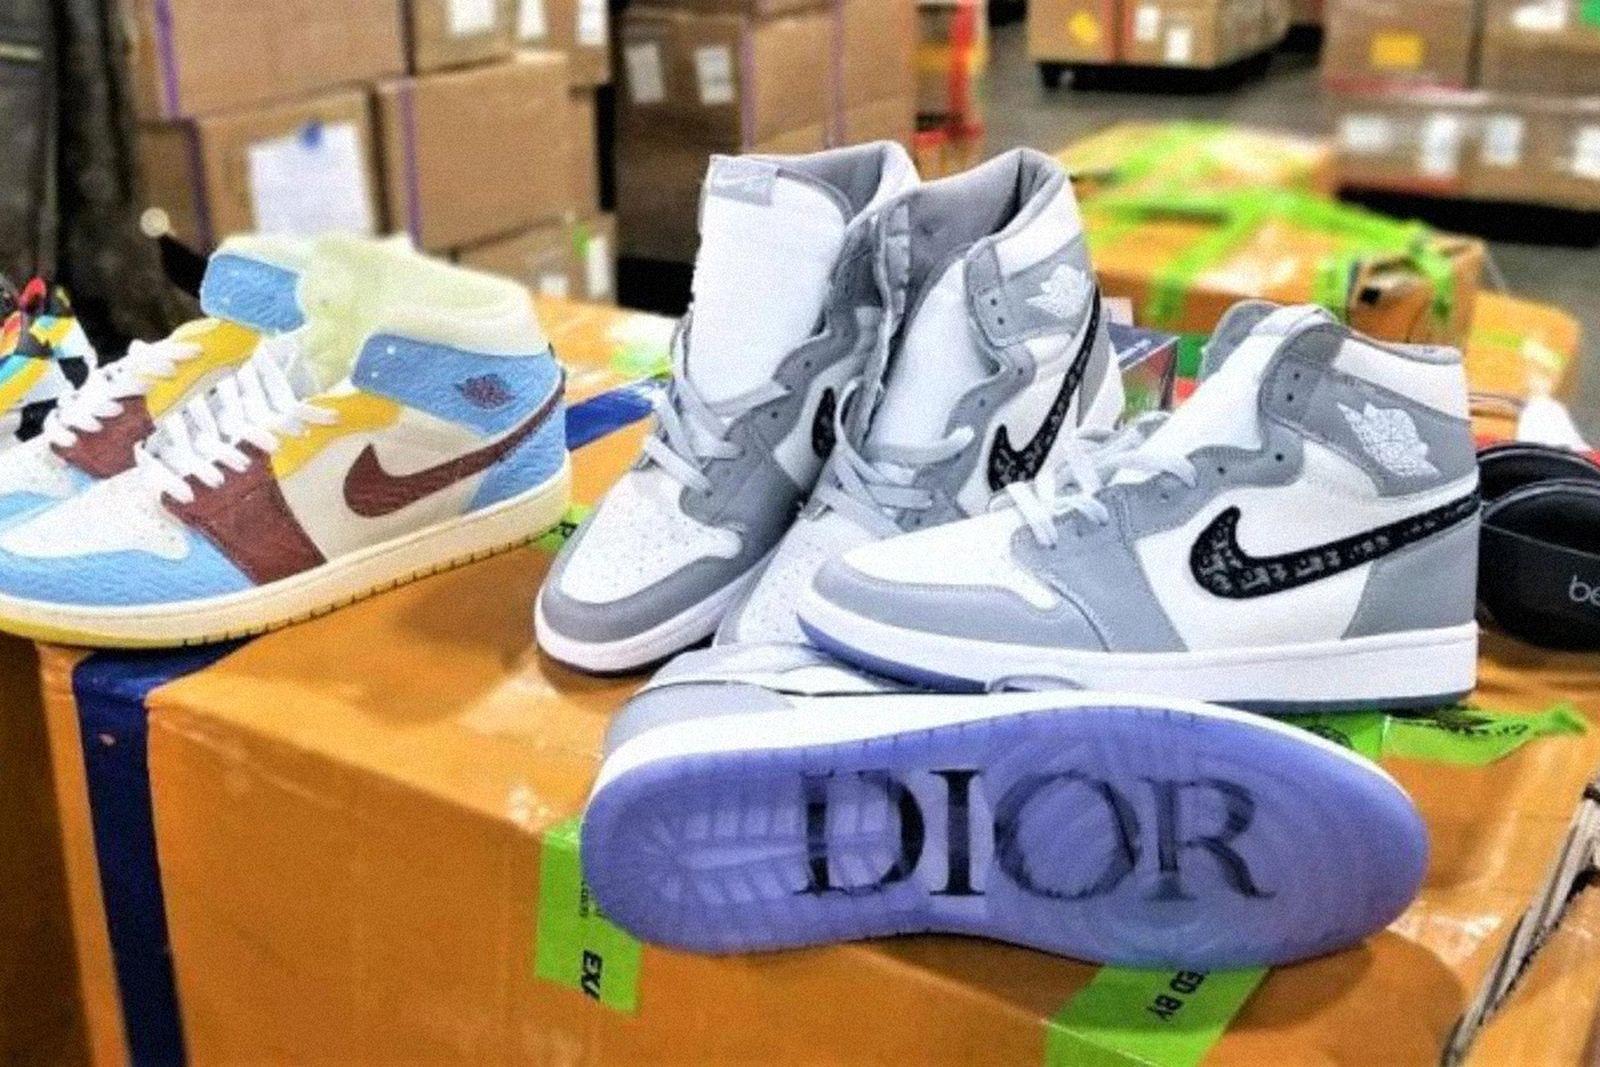 counterfeit-sneakers-cbp-main